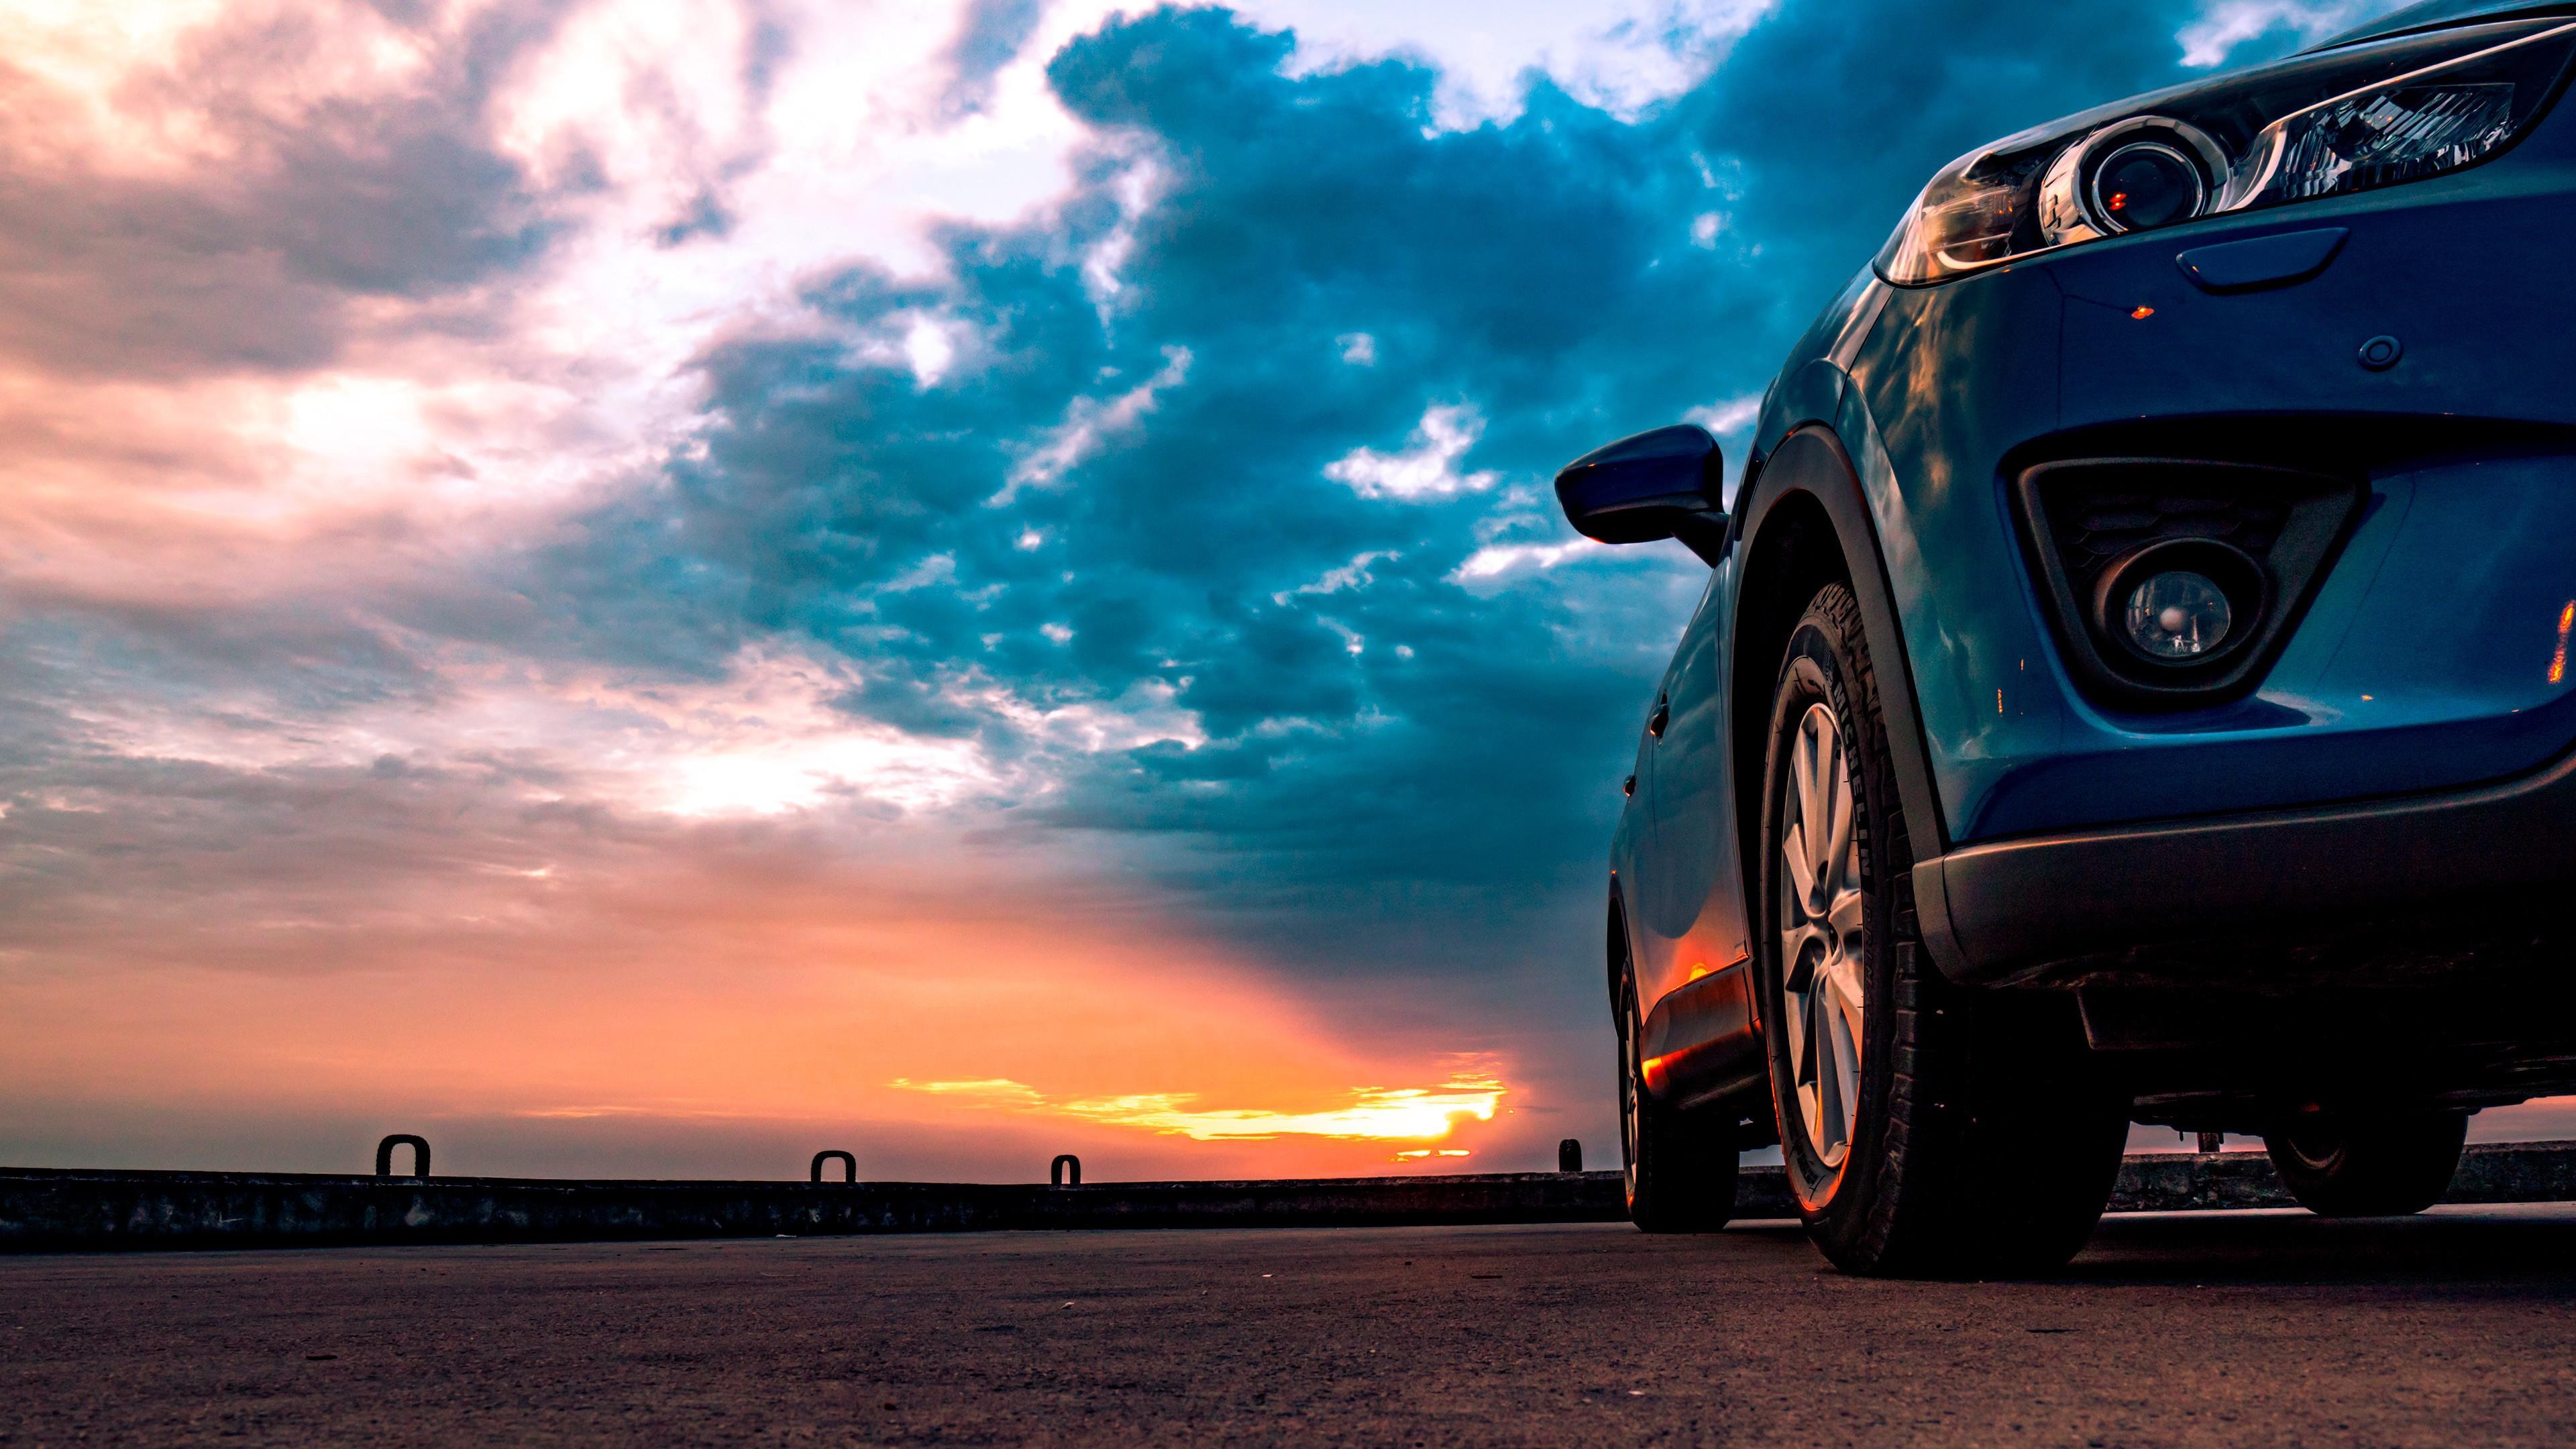 Sports car at sunset wallpaper